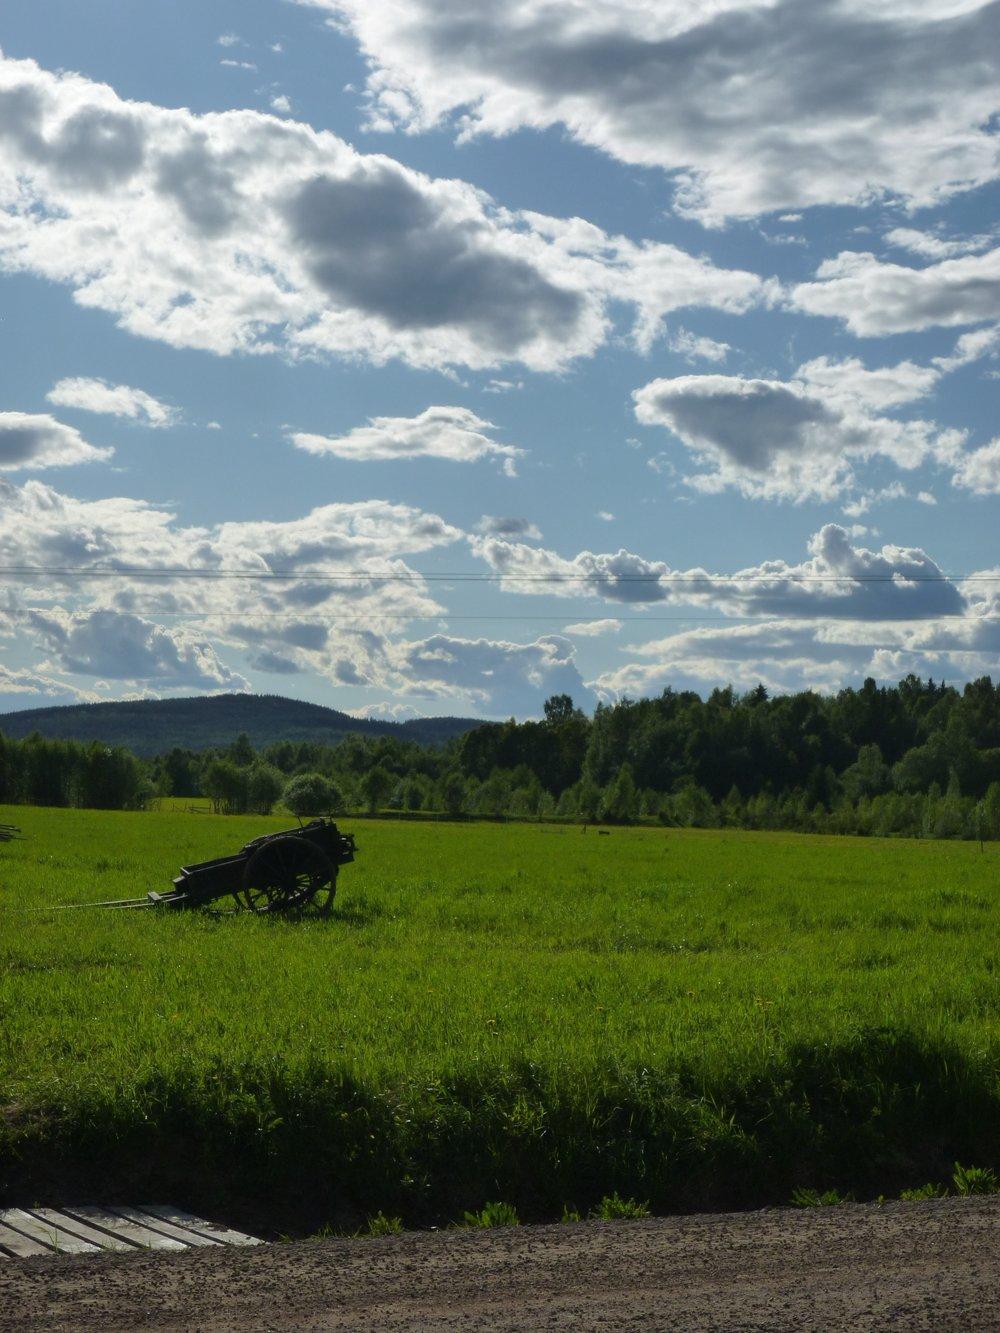 boerderij värmland zweden.JPG